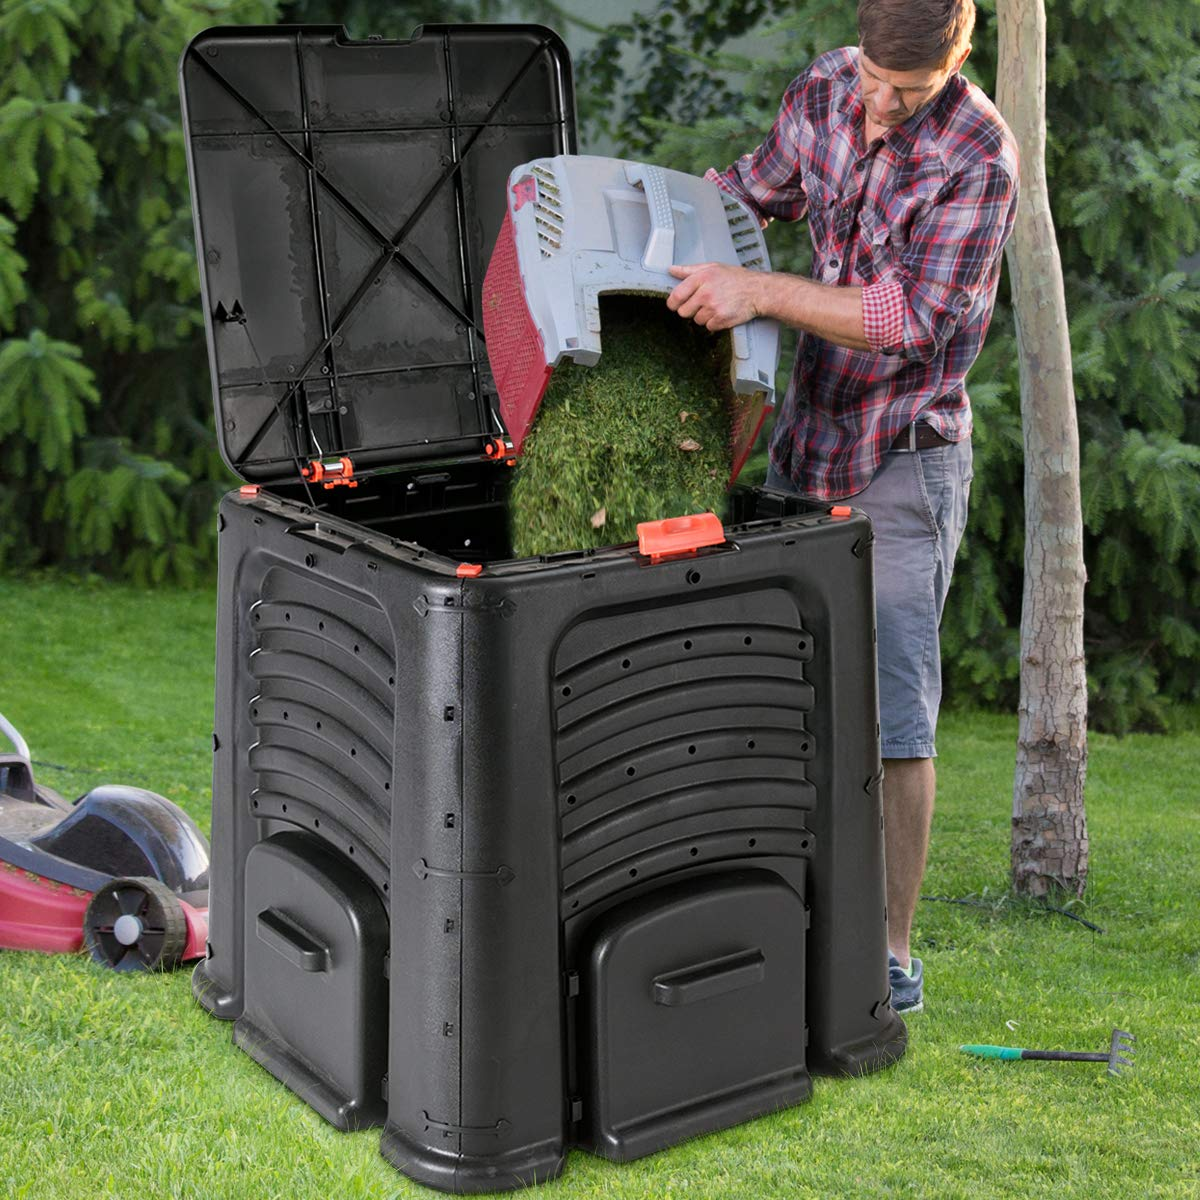 Goplus 105-Gallon Classic Compost Bin Large Garden Waste Bin Grass Food Trash Fertilizer Barrel Soil Saver Outdoor Composter Black Superbuy